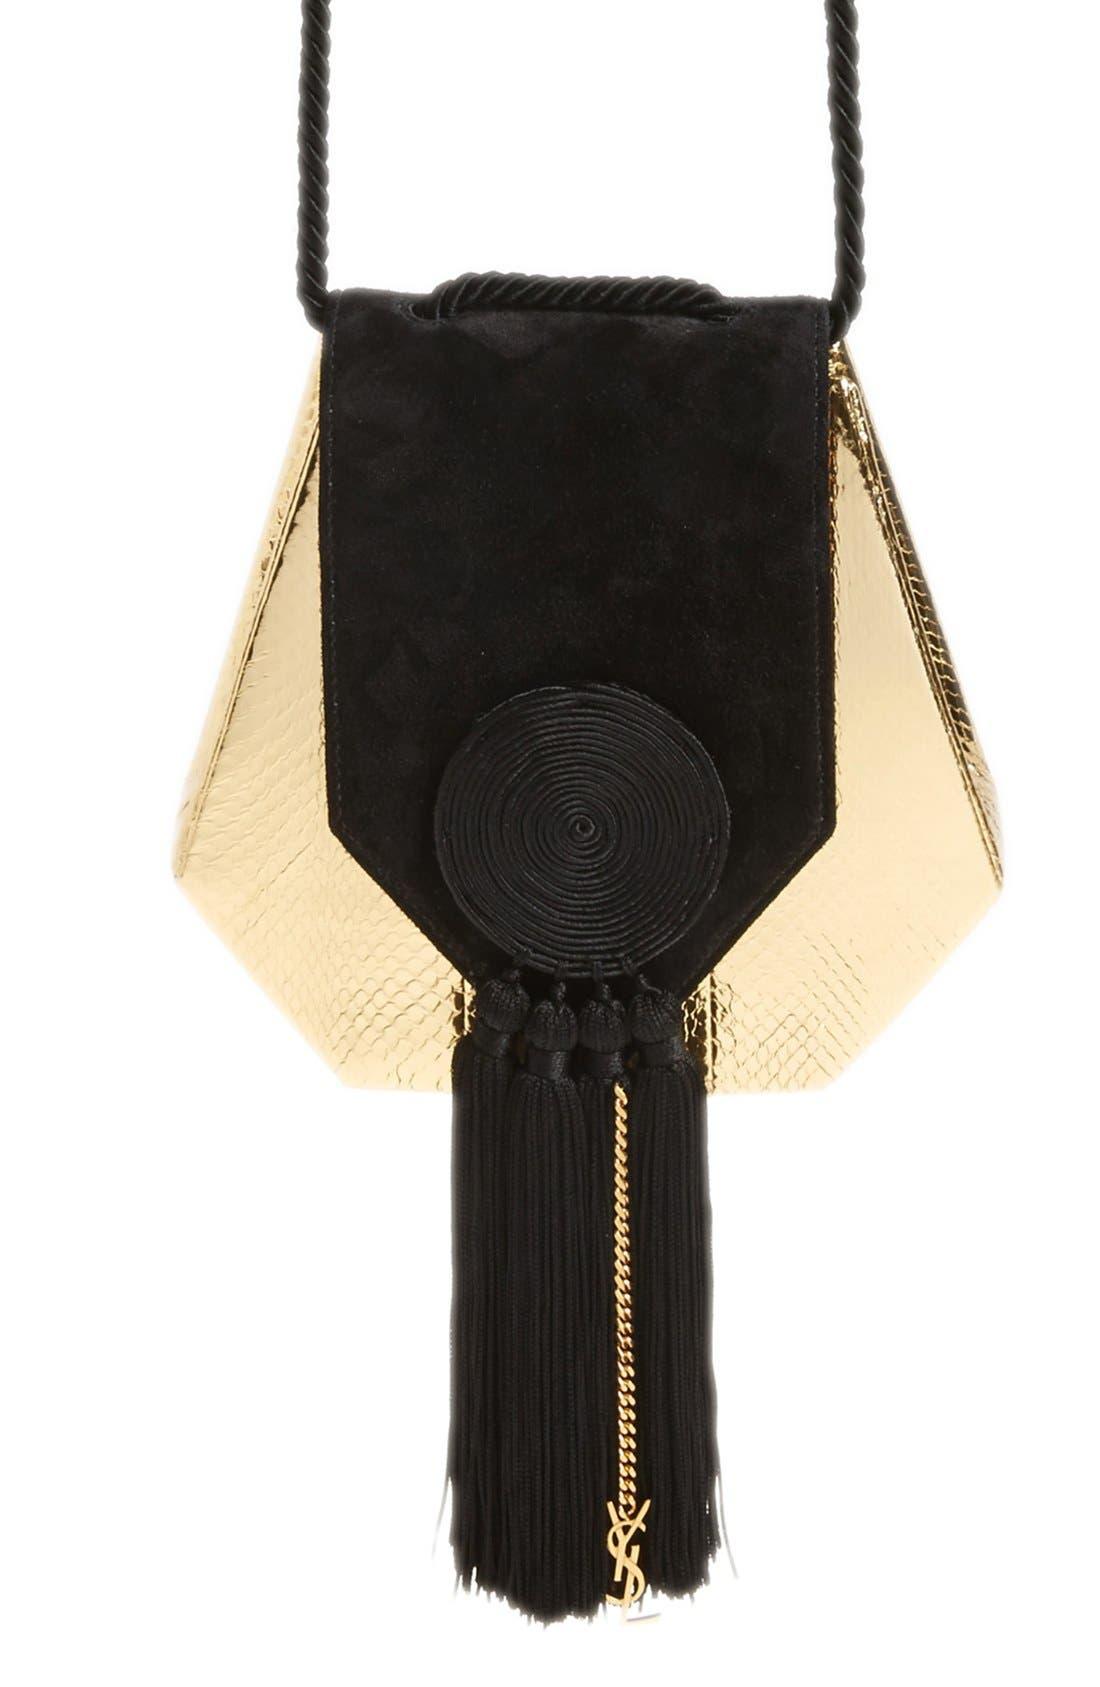 Main Image - Saint Laurent 'Opium' Genuine Snakeskin & Leather Saddle Bag